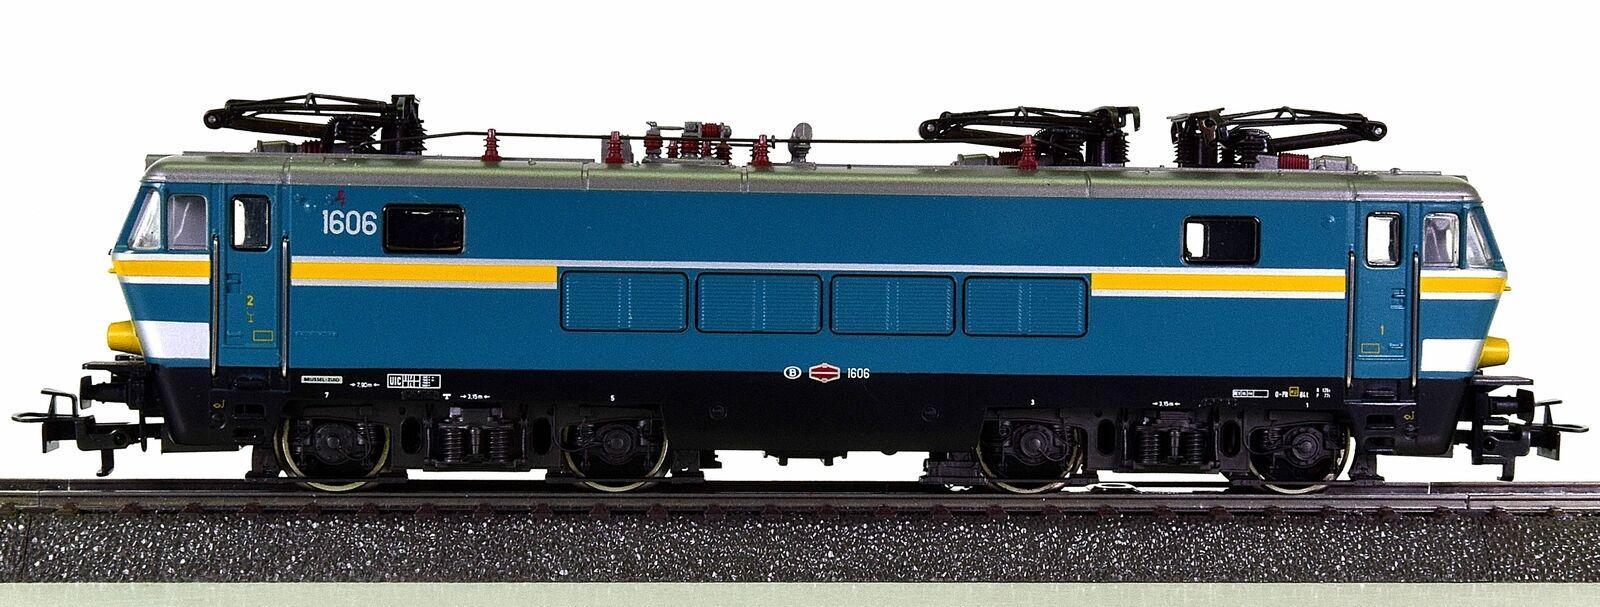 Märklin 3363 – Schnellzug-Elektrolok Serie 16 16 16 der SNCB, Club-Sondermodell    Tragen-wider  1e4dca